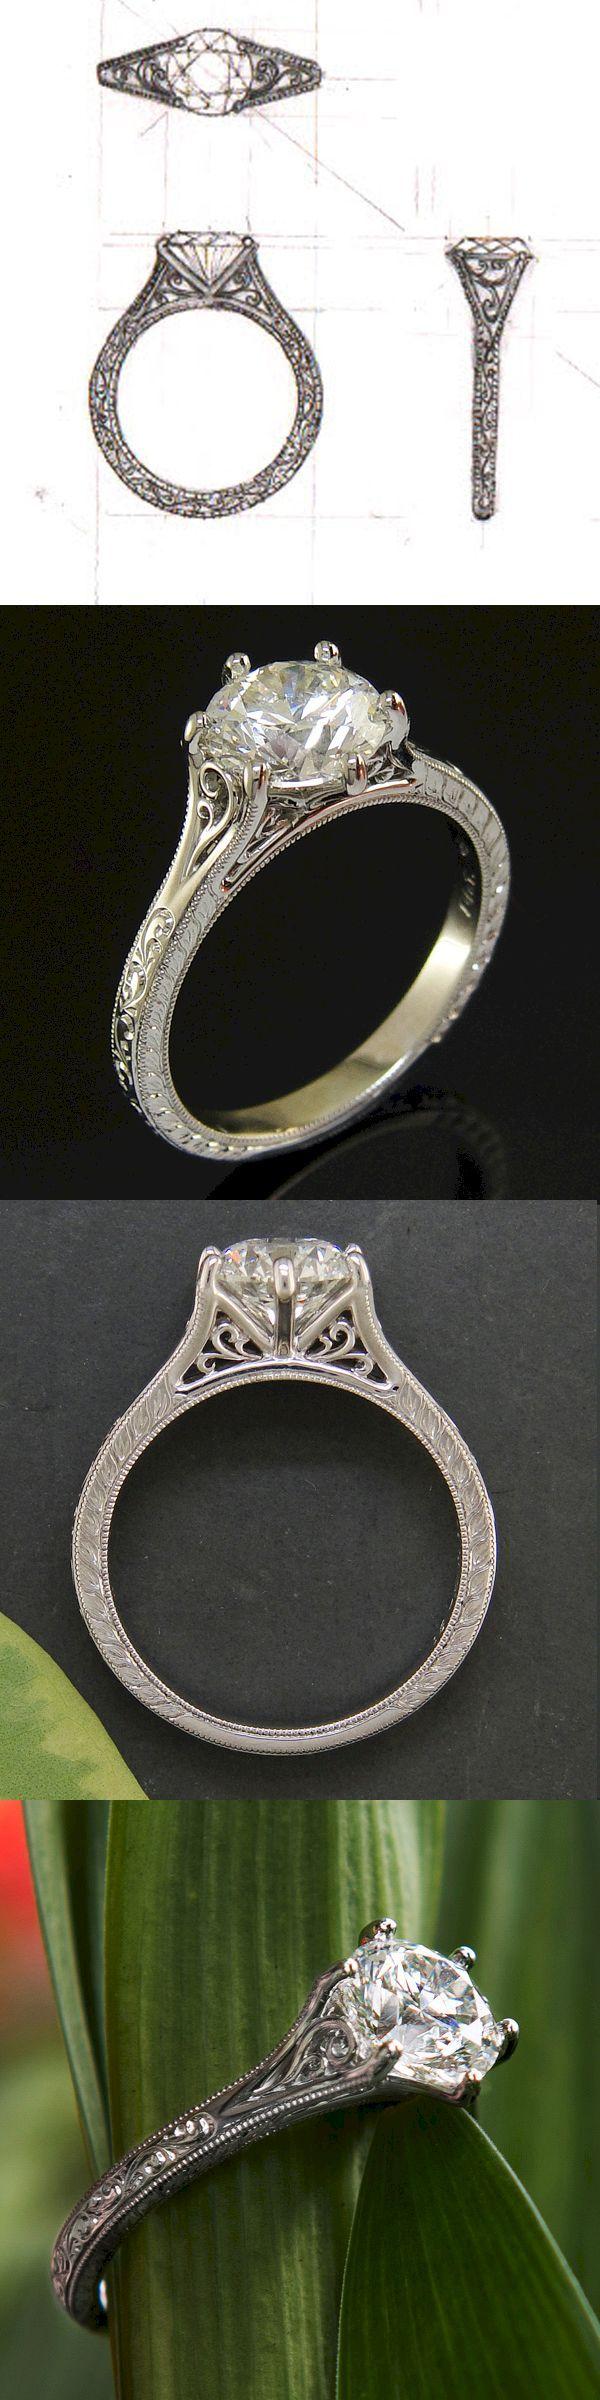 Nice breathtaking vintage engagement rings inspirations